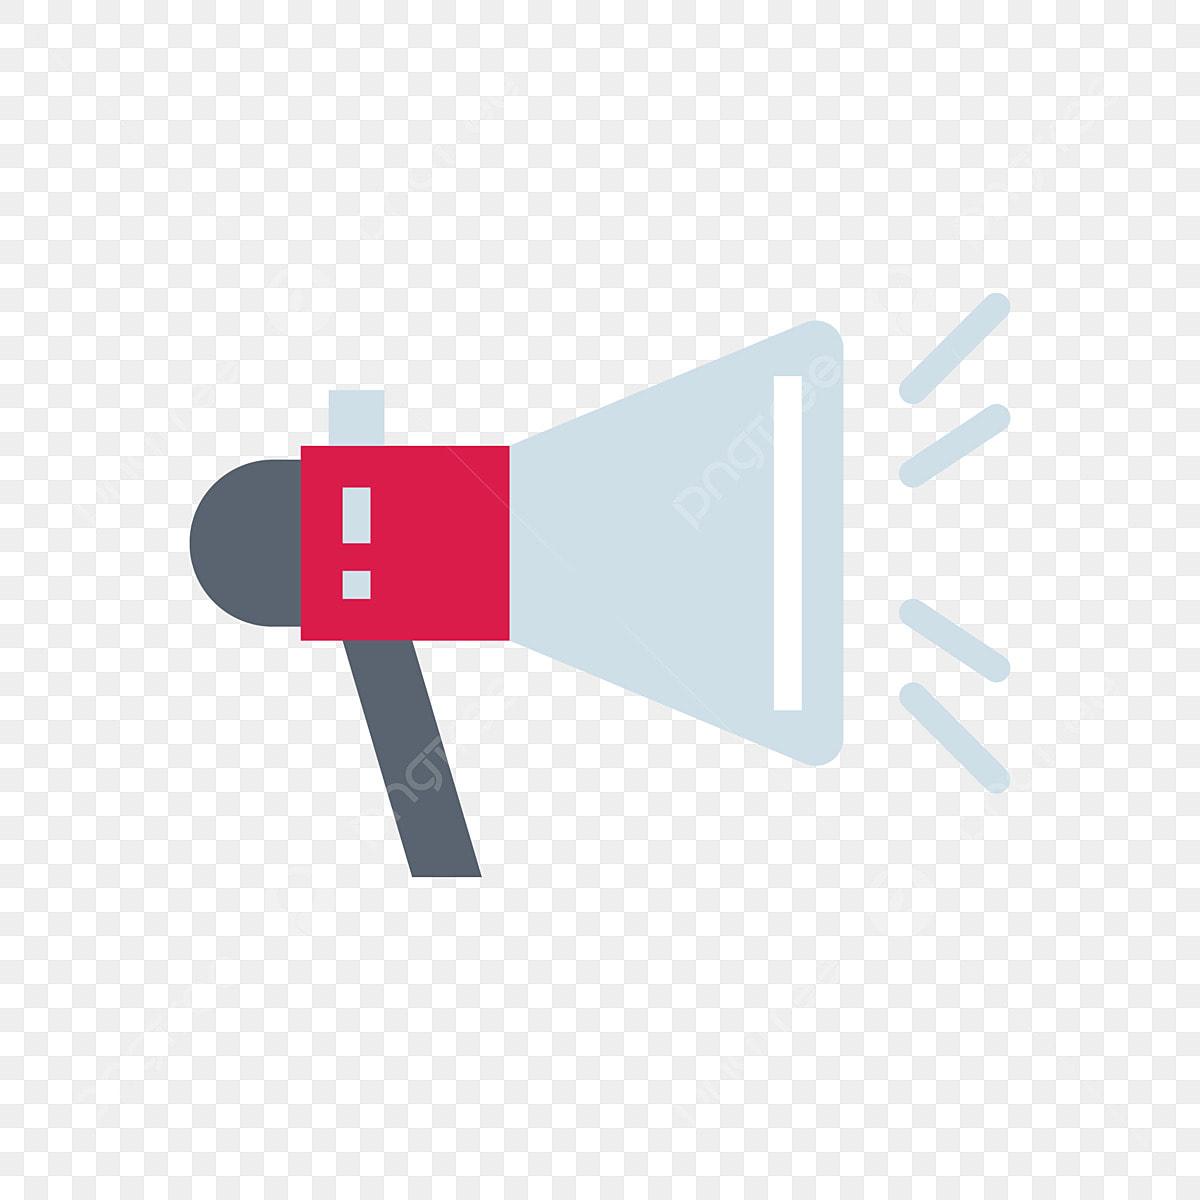 Horn Sound Music Dialogue, Shout, Loudspeaker, Cartoon PNG